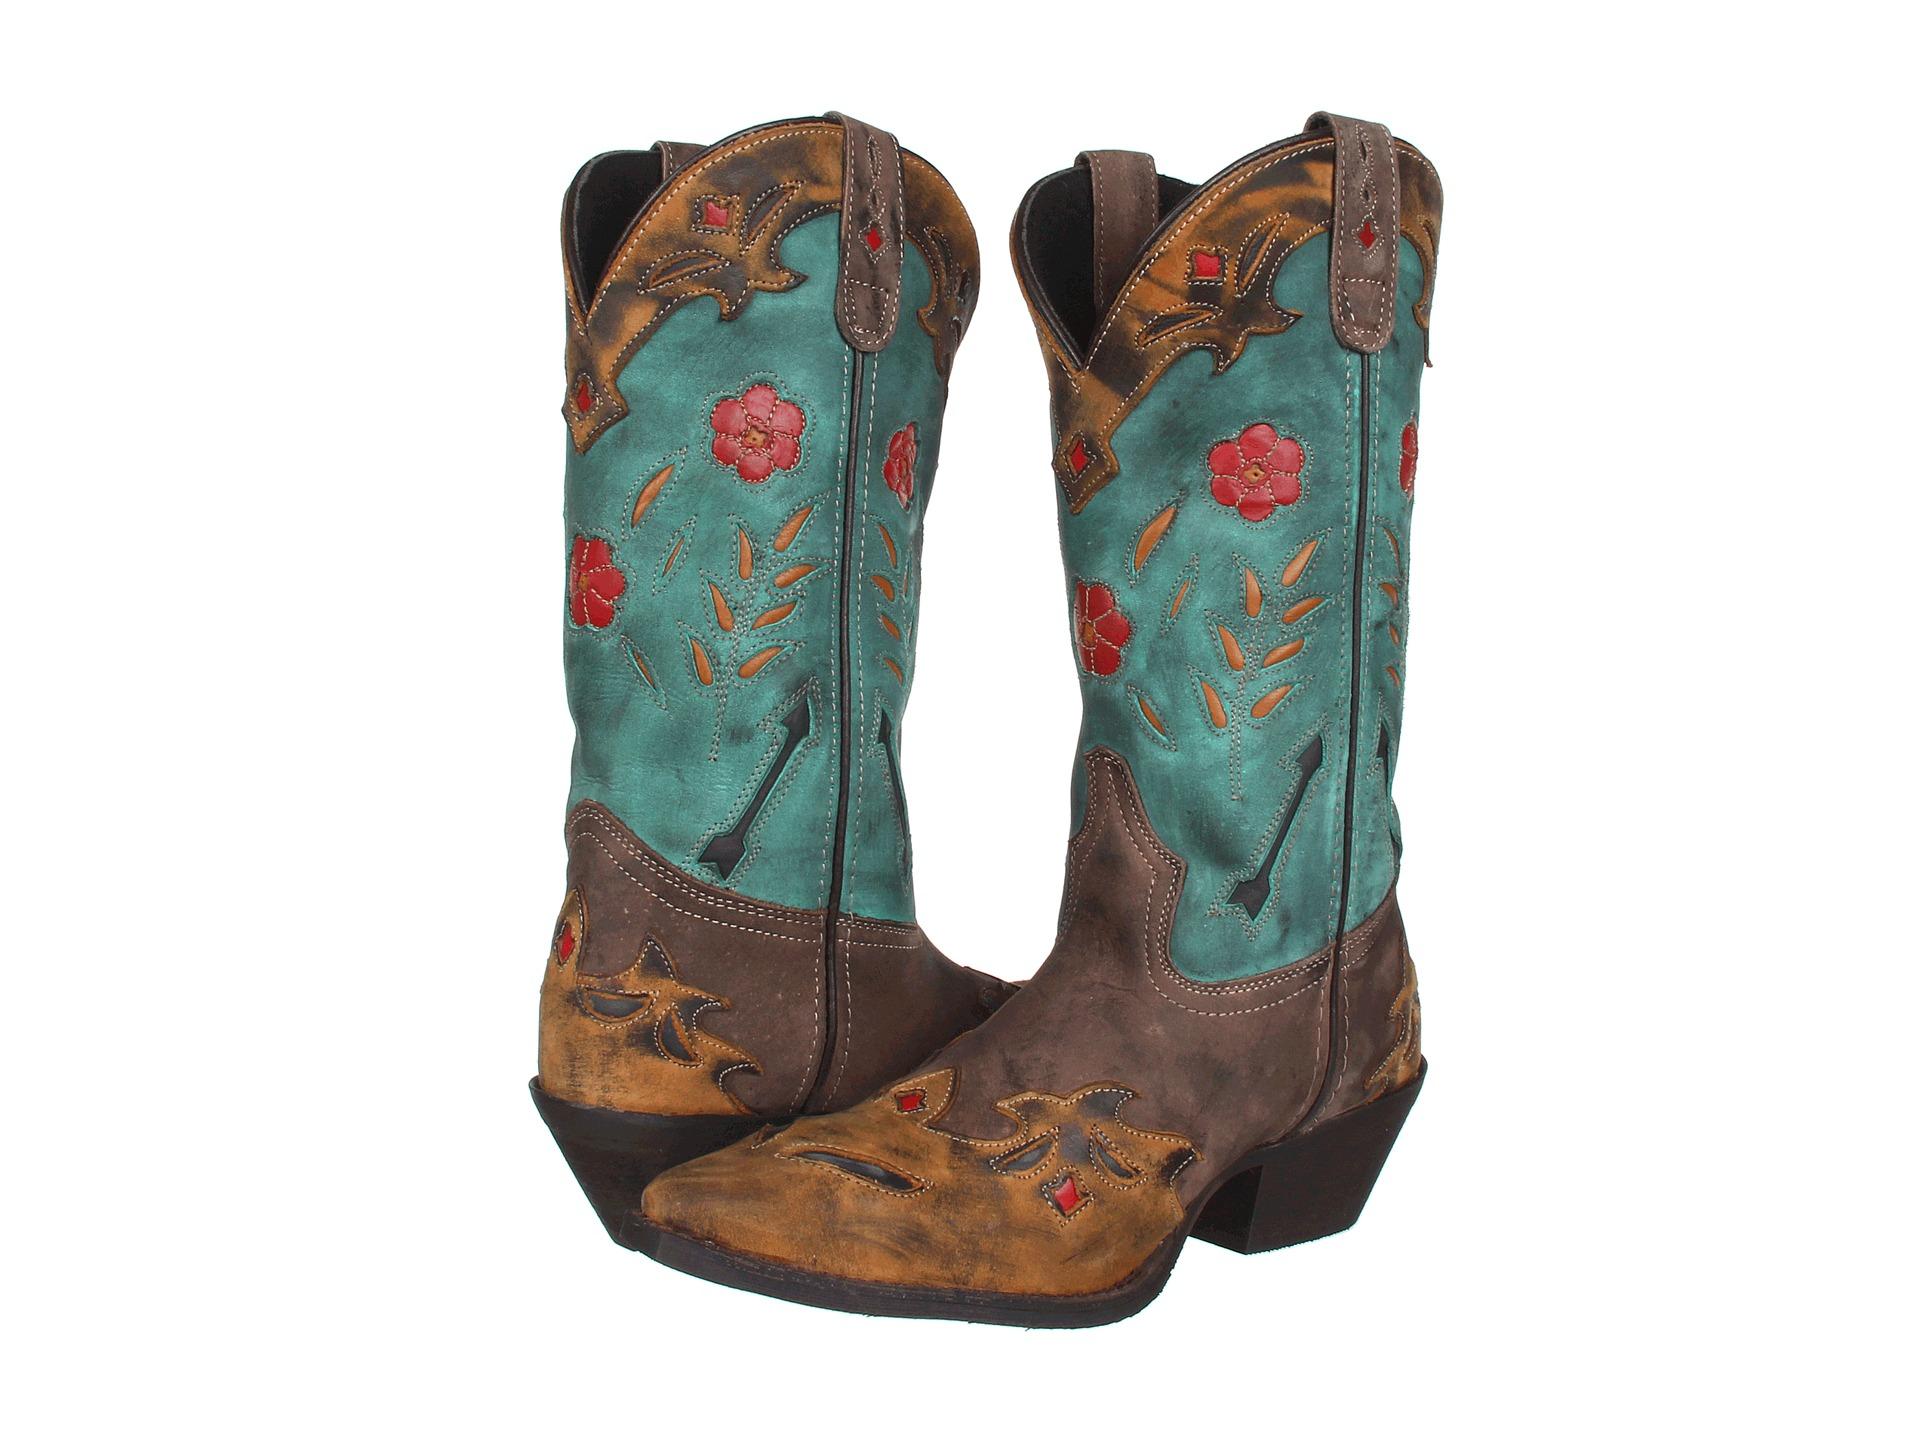 Simple Laredo Western Boots Womens Aphfricka Leopard Inlay Cowboy Black 52130 - Walmart.com